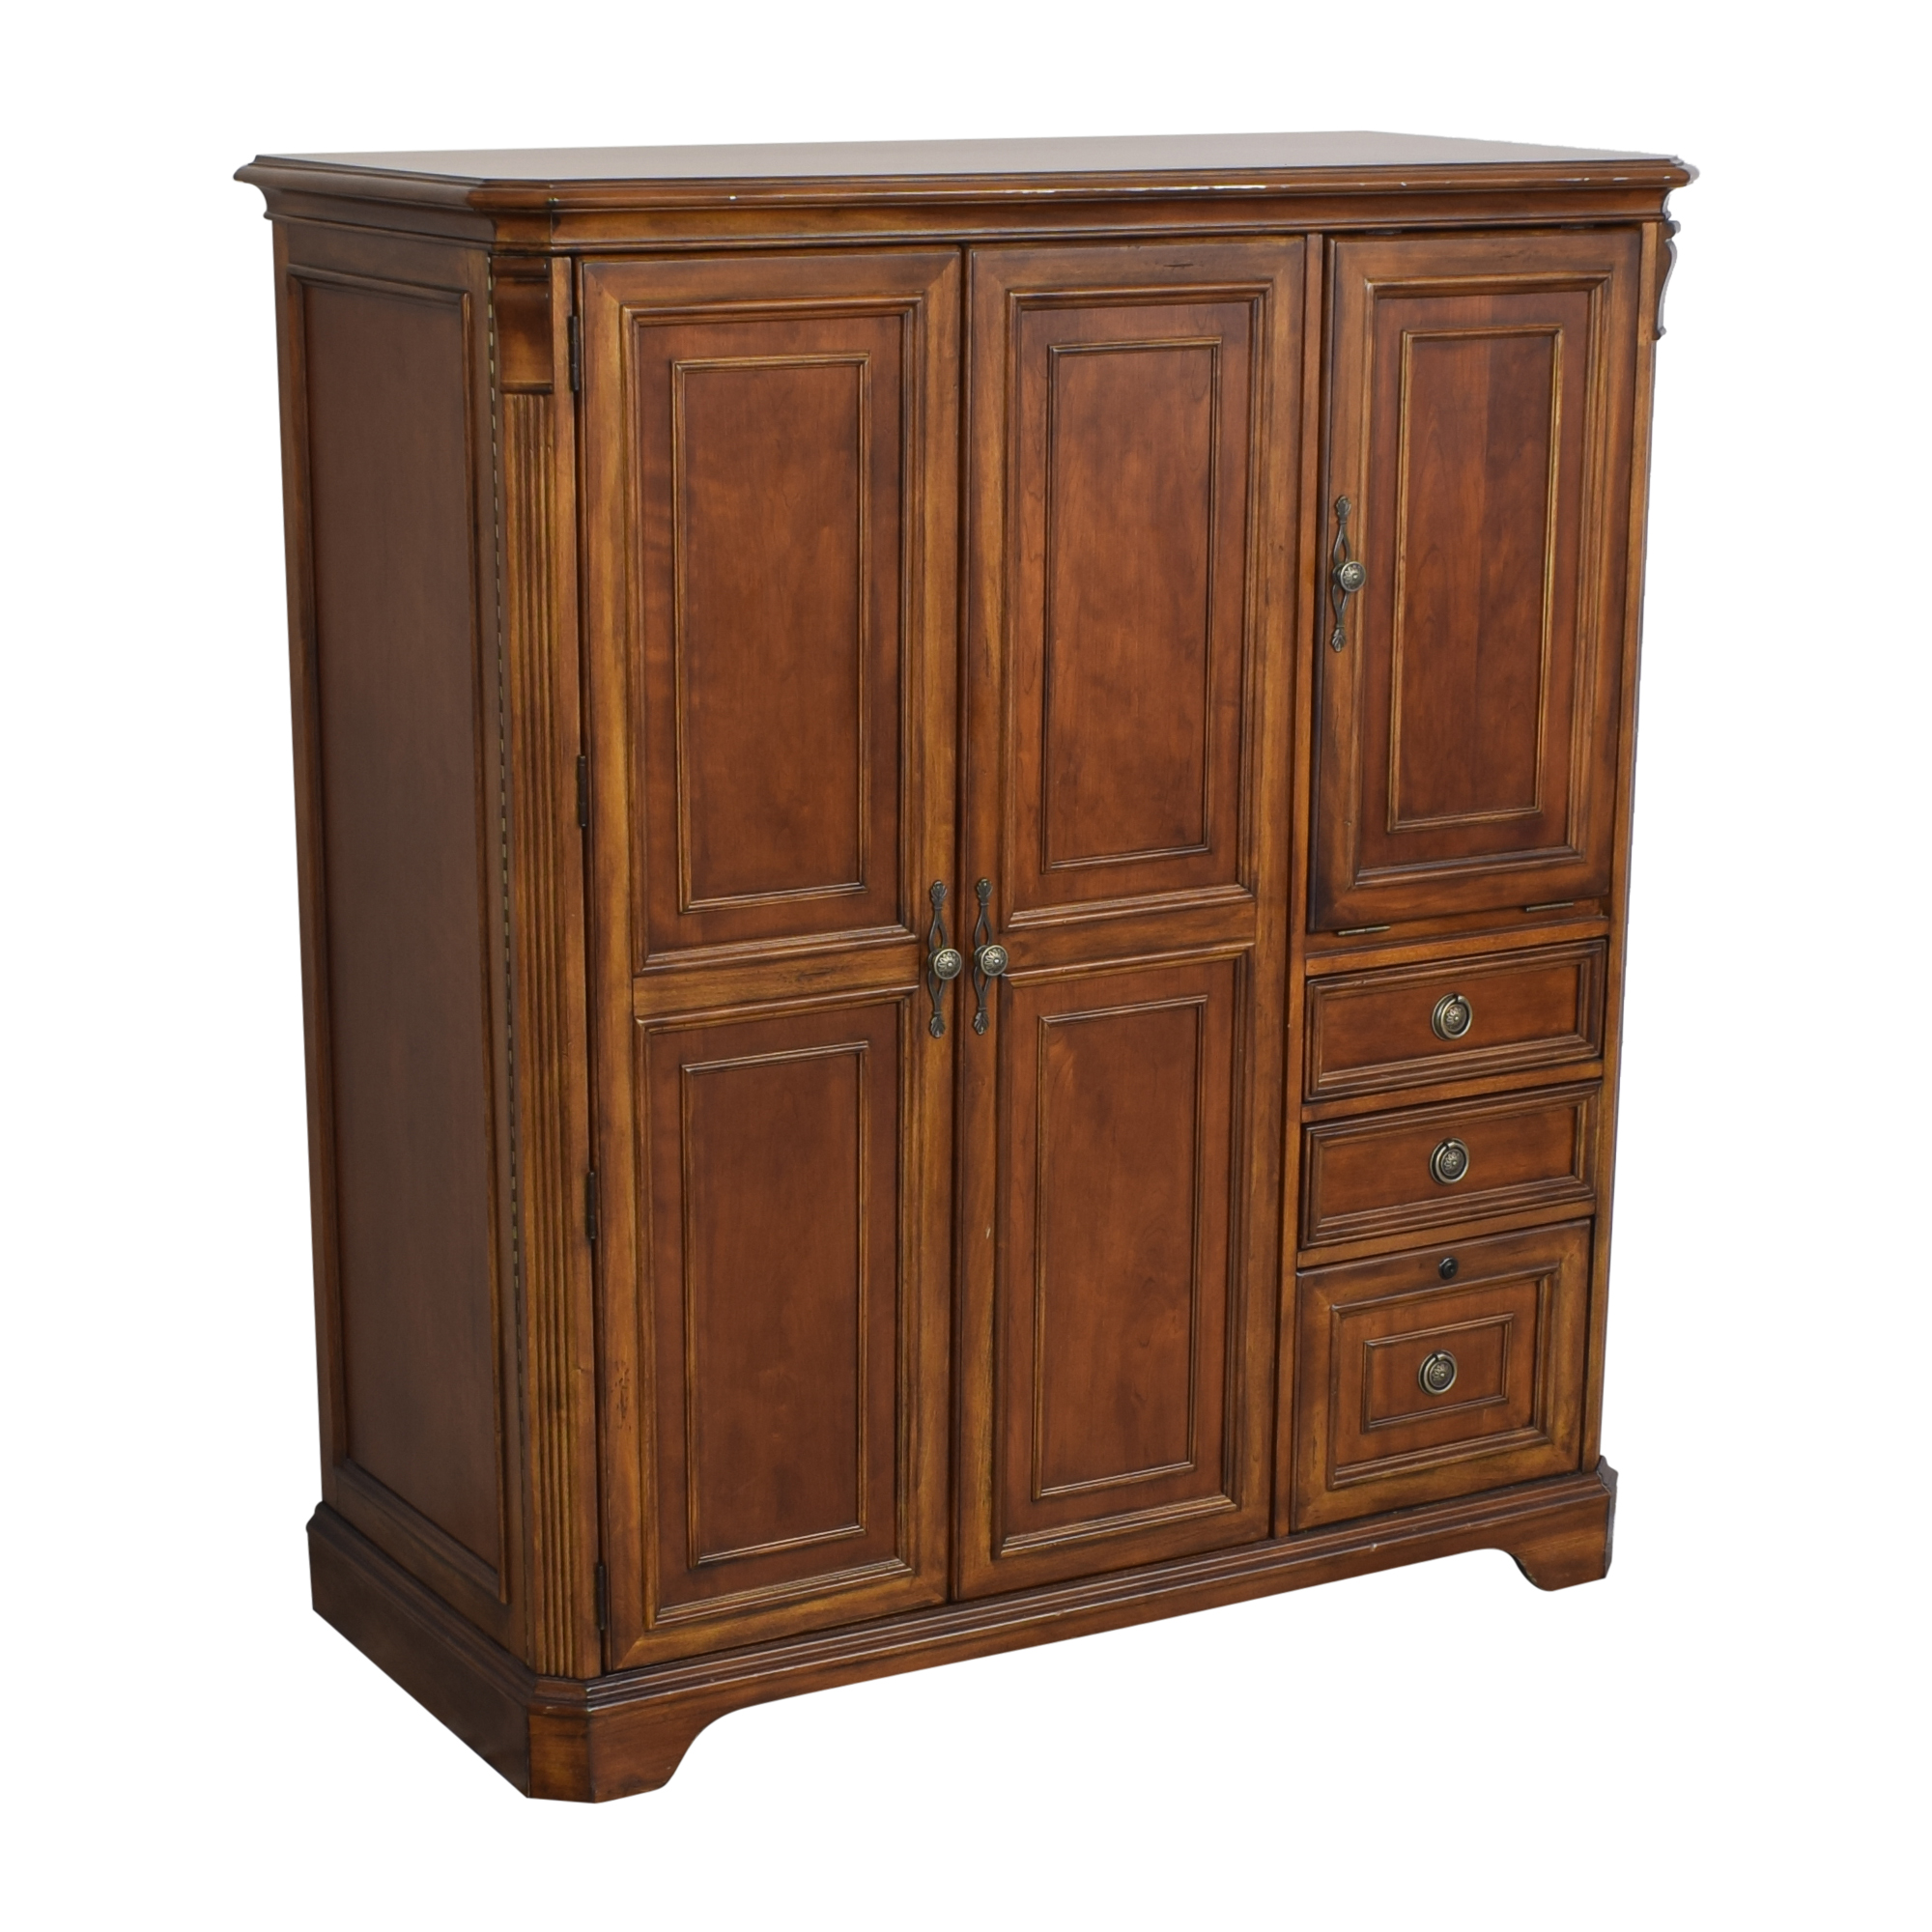 Hooker Furniture Hooker Furniture Office Armoire dimensions